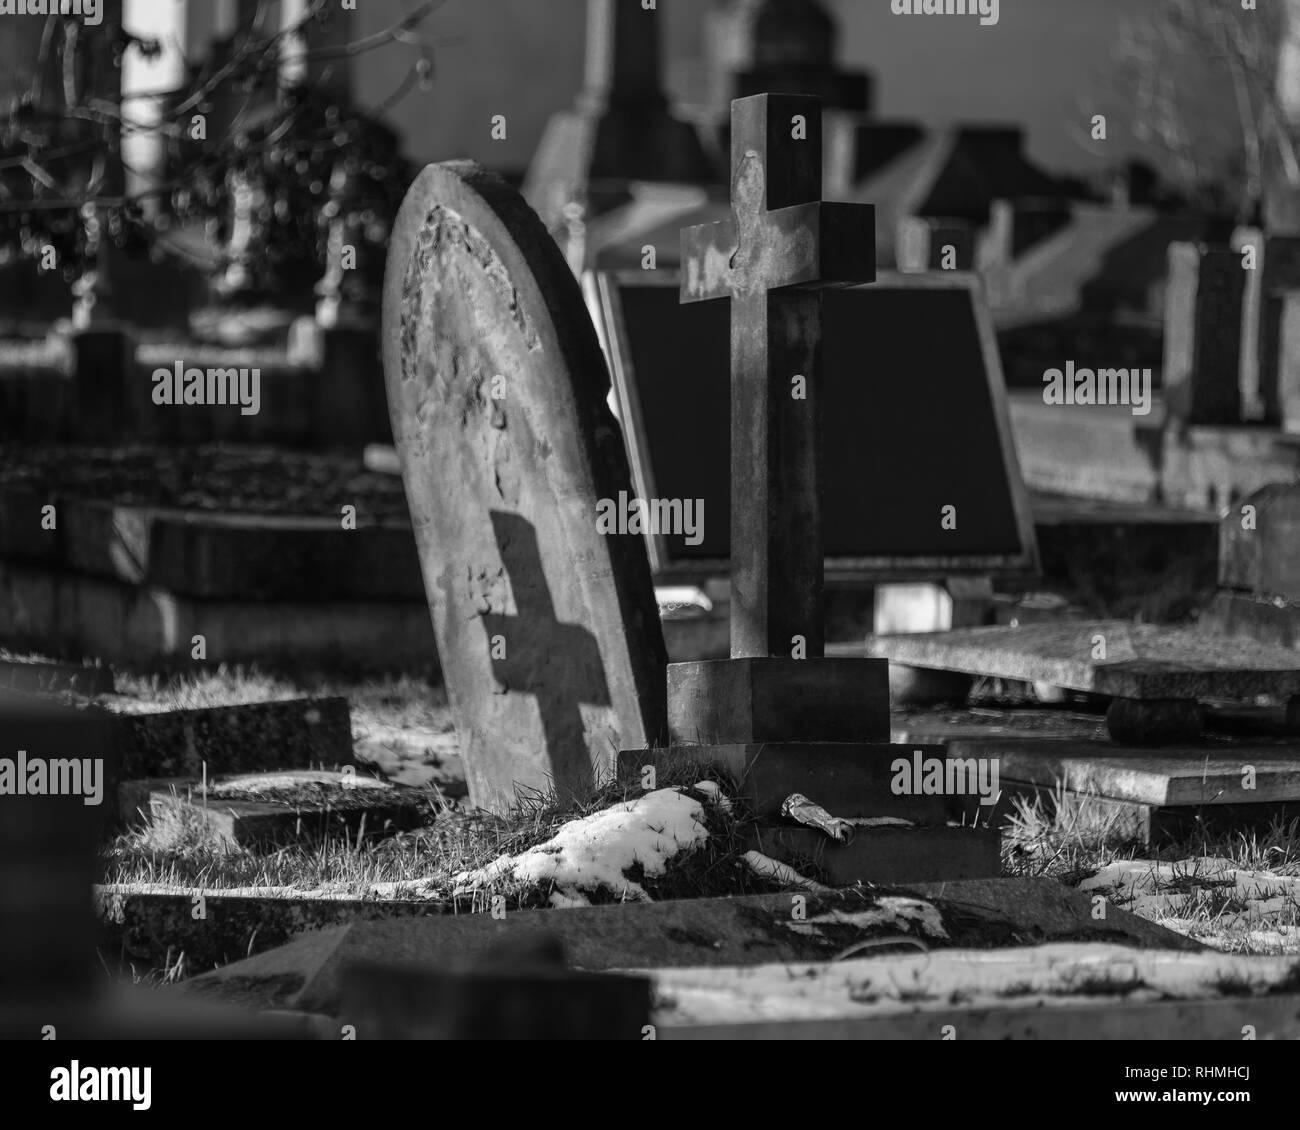 Kensal Green Cemetery, London, England, United Kingdom - Stock Image